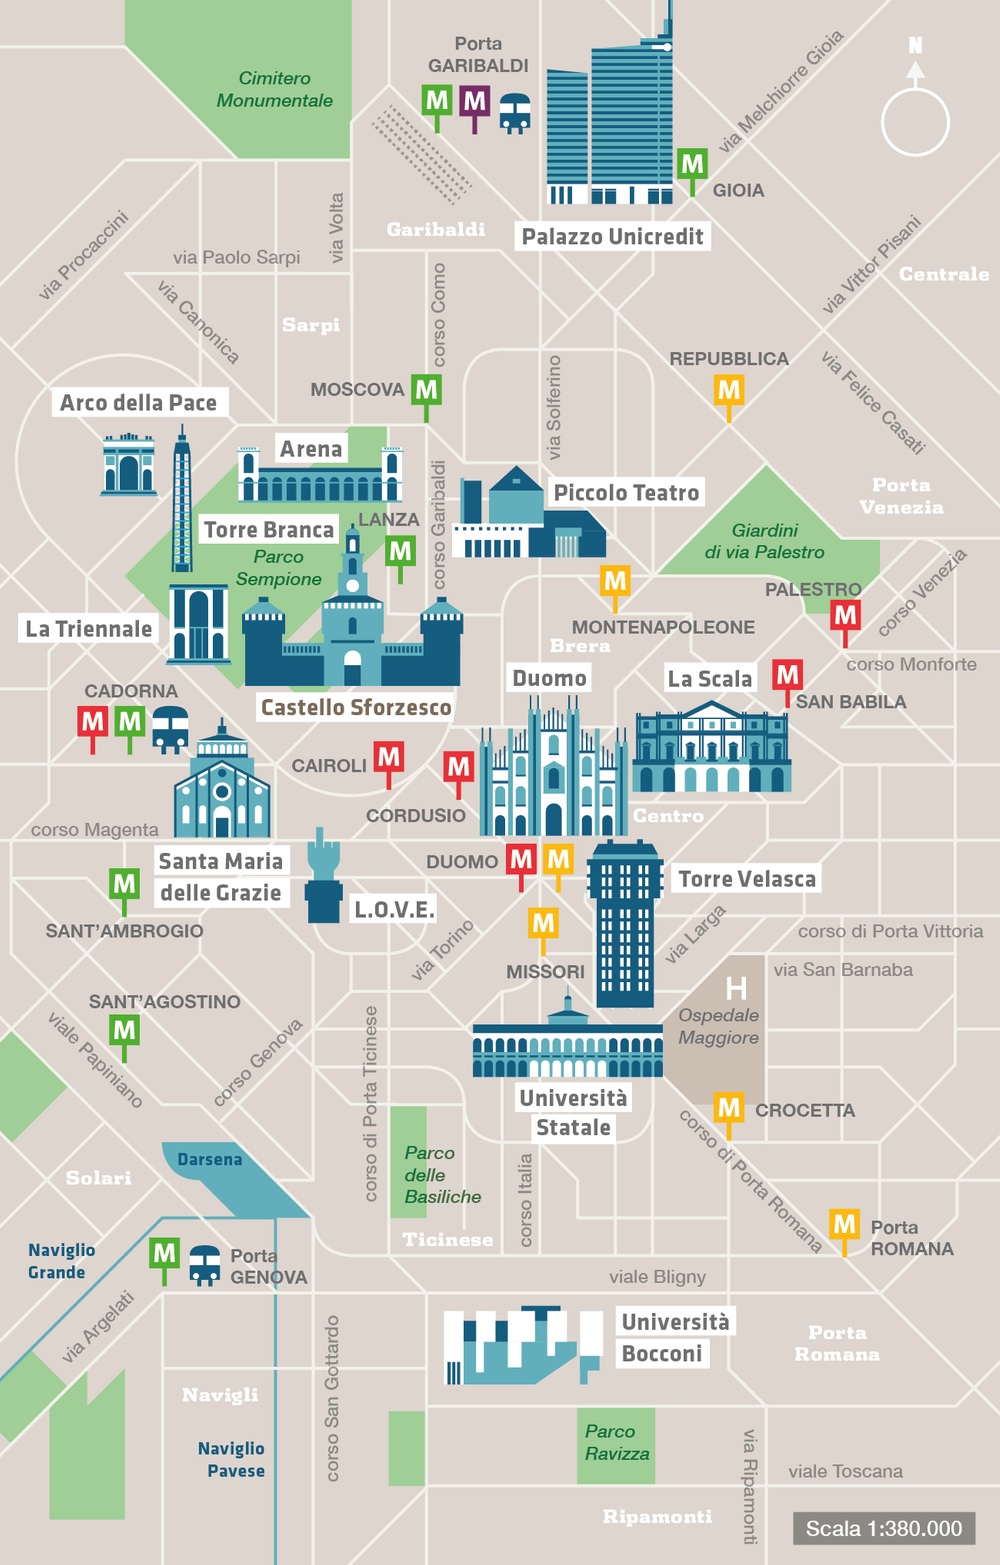 Norditalien Karte.Maps Milano Confidential Bur Rizzoli Crockhaus In 2019